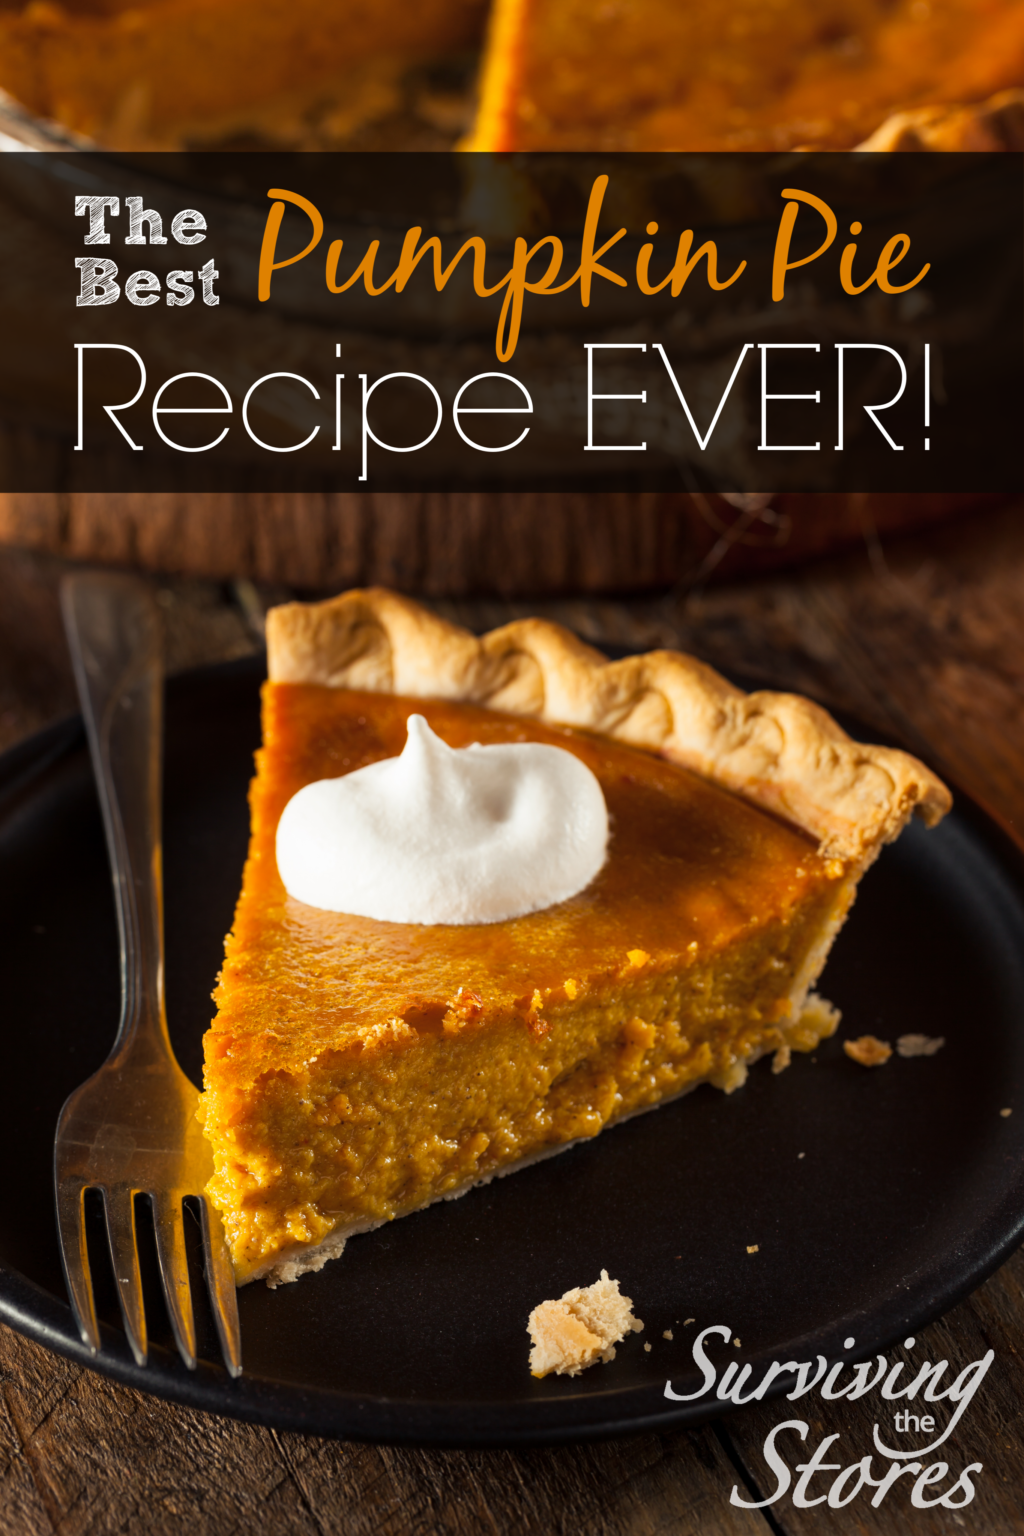 My Favorite Homemade Pumpkin Pie Recipe Pumpkin Pie Recipes Pumpkin Pie Homemade Pumpkin Pie